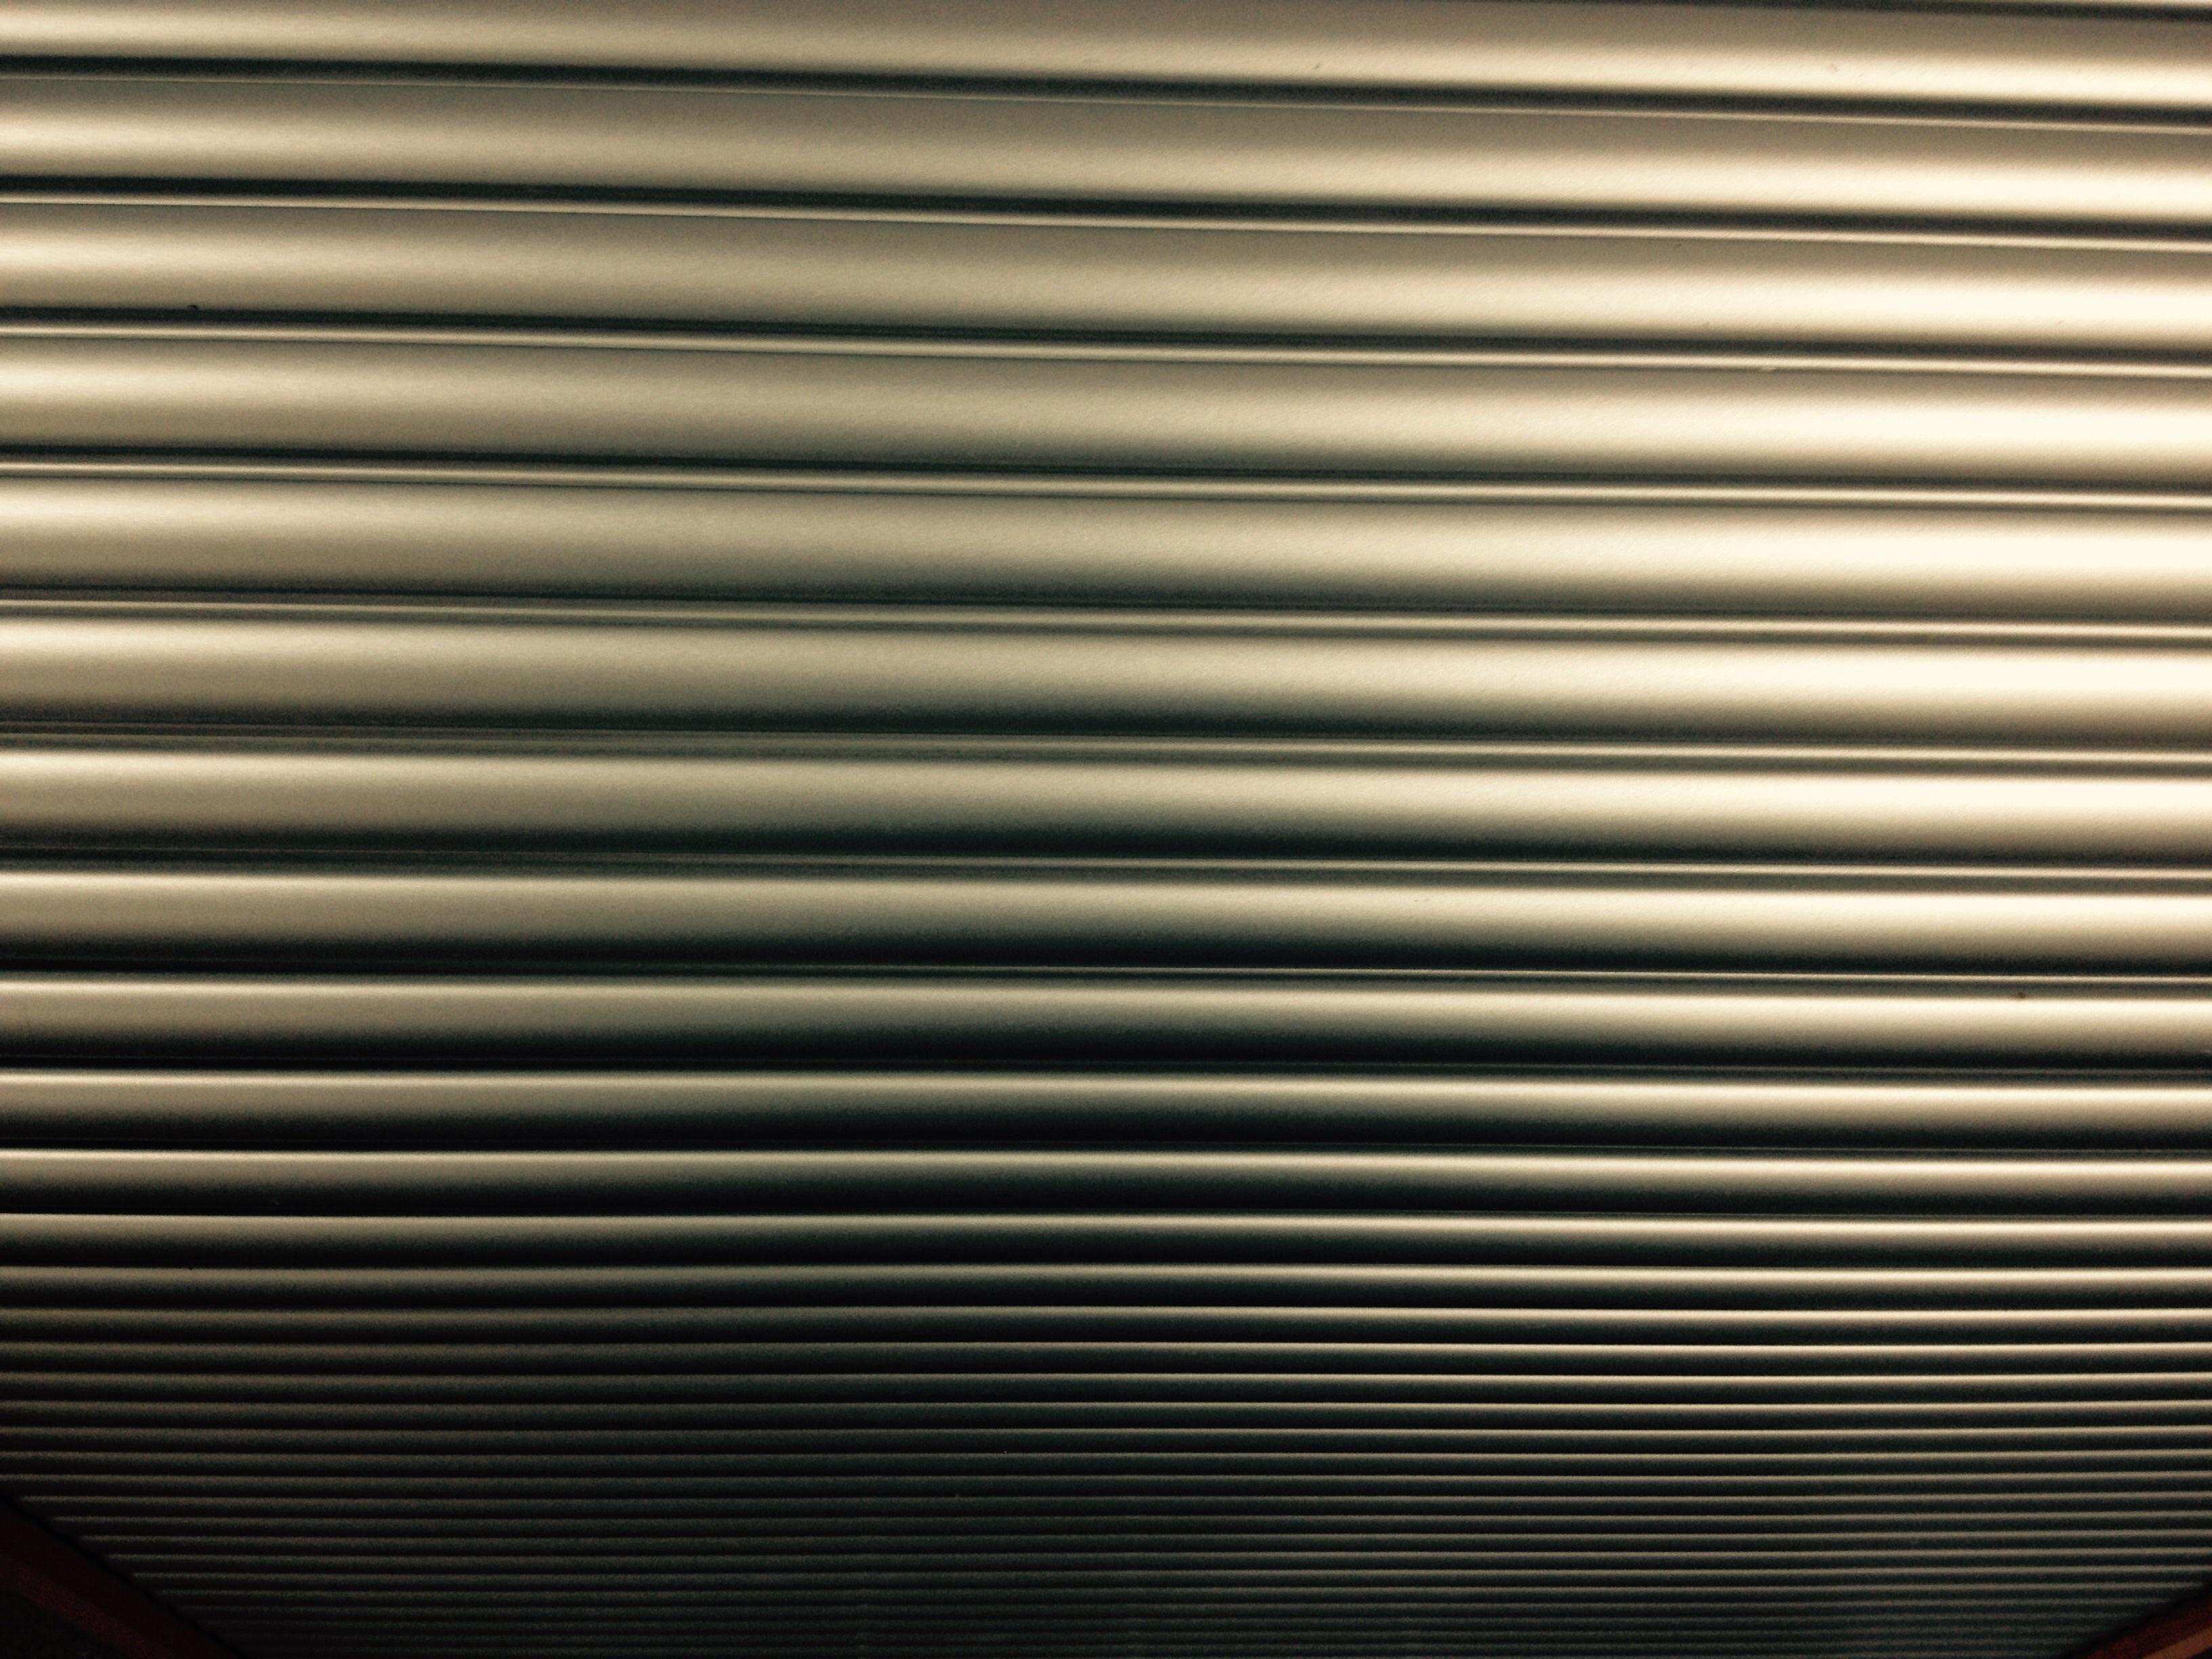 Light Structure Wood Plastic Steel Line Metal Office Lighting Material  Interior Design Cabinet Grey Shutters Design Part 50